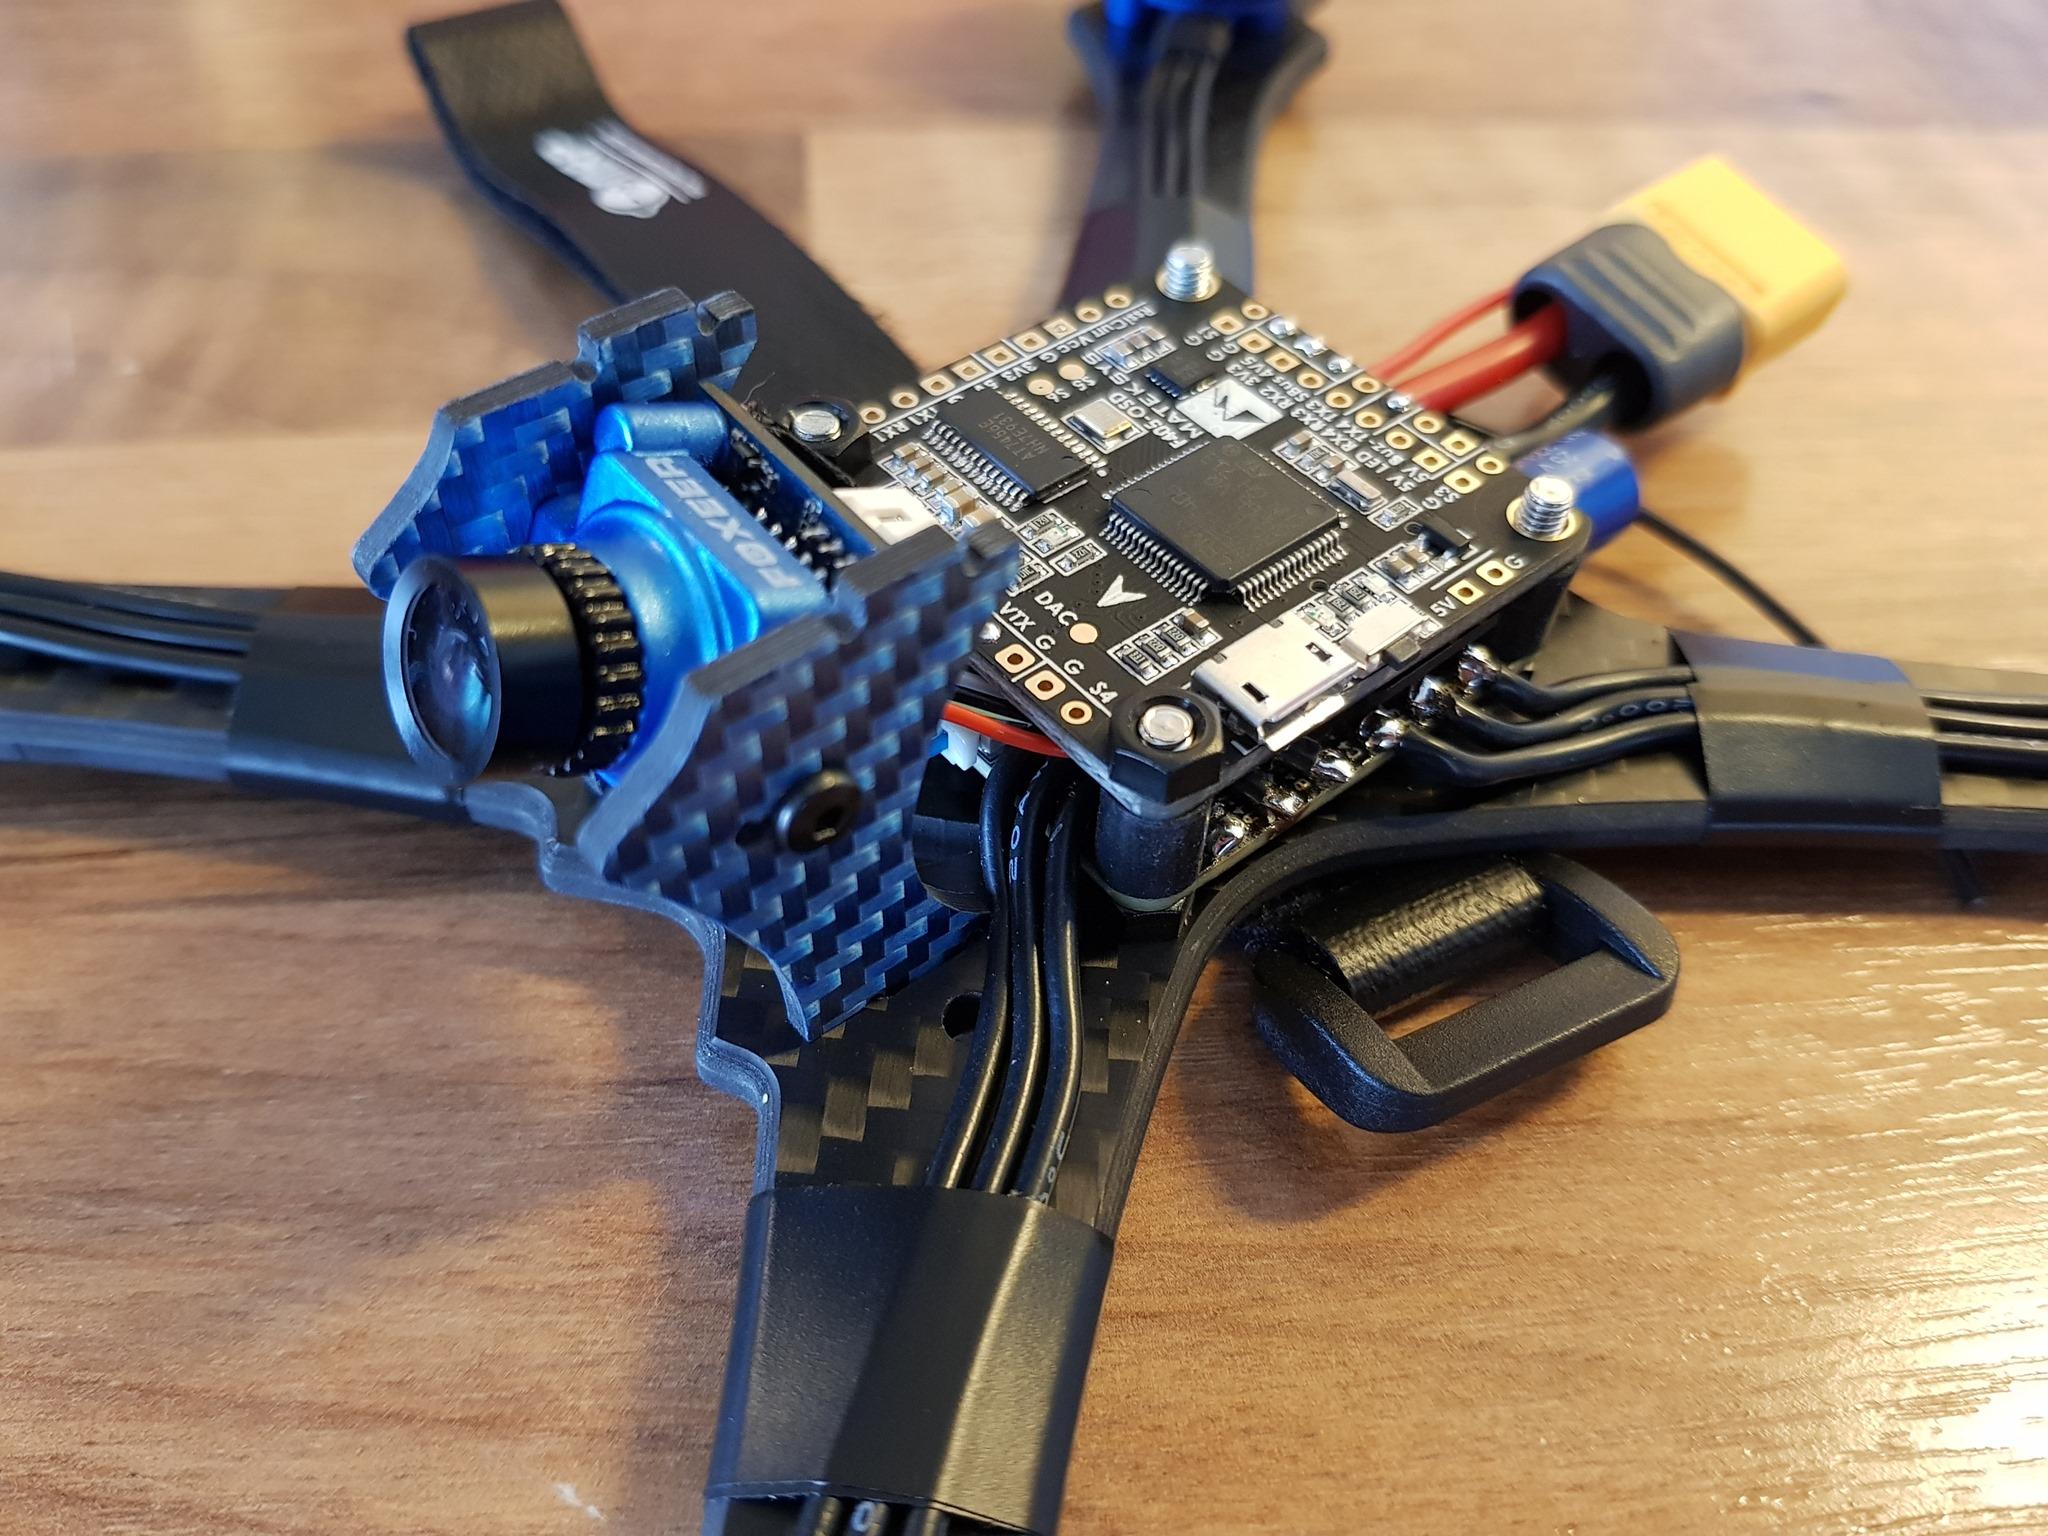 DroneHiTech com – Avantquads Xero S5M build log